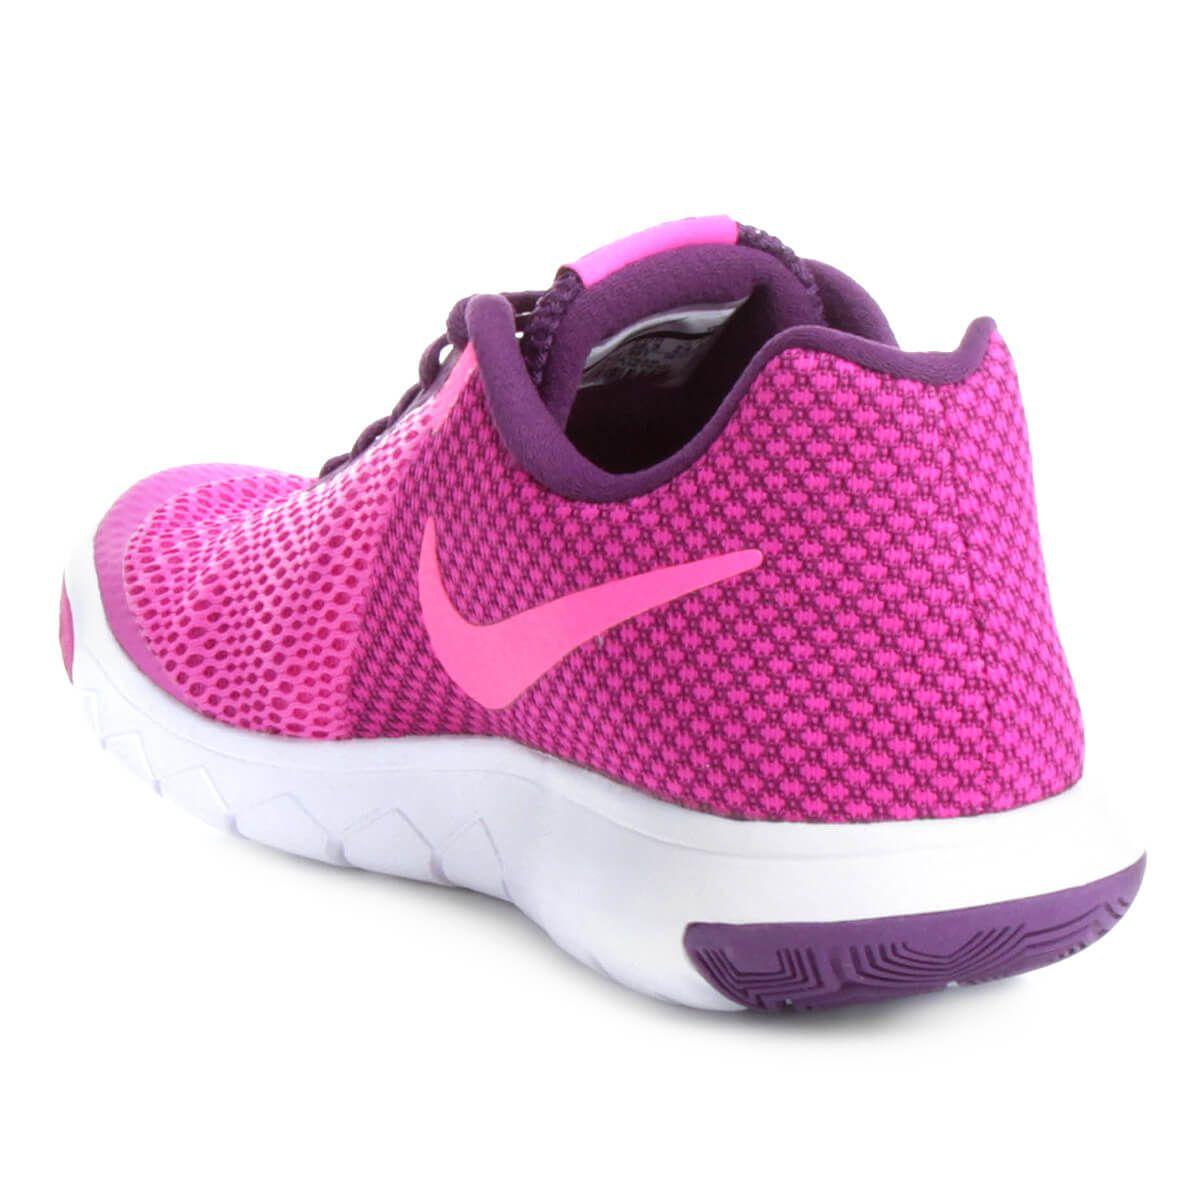 Tênis Nike Feminino Flex Experience Rn 6 - BRACIA SHOP  Loja de ... 7c8d6b3f787